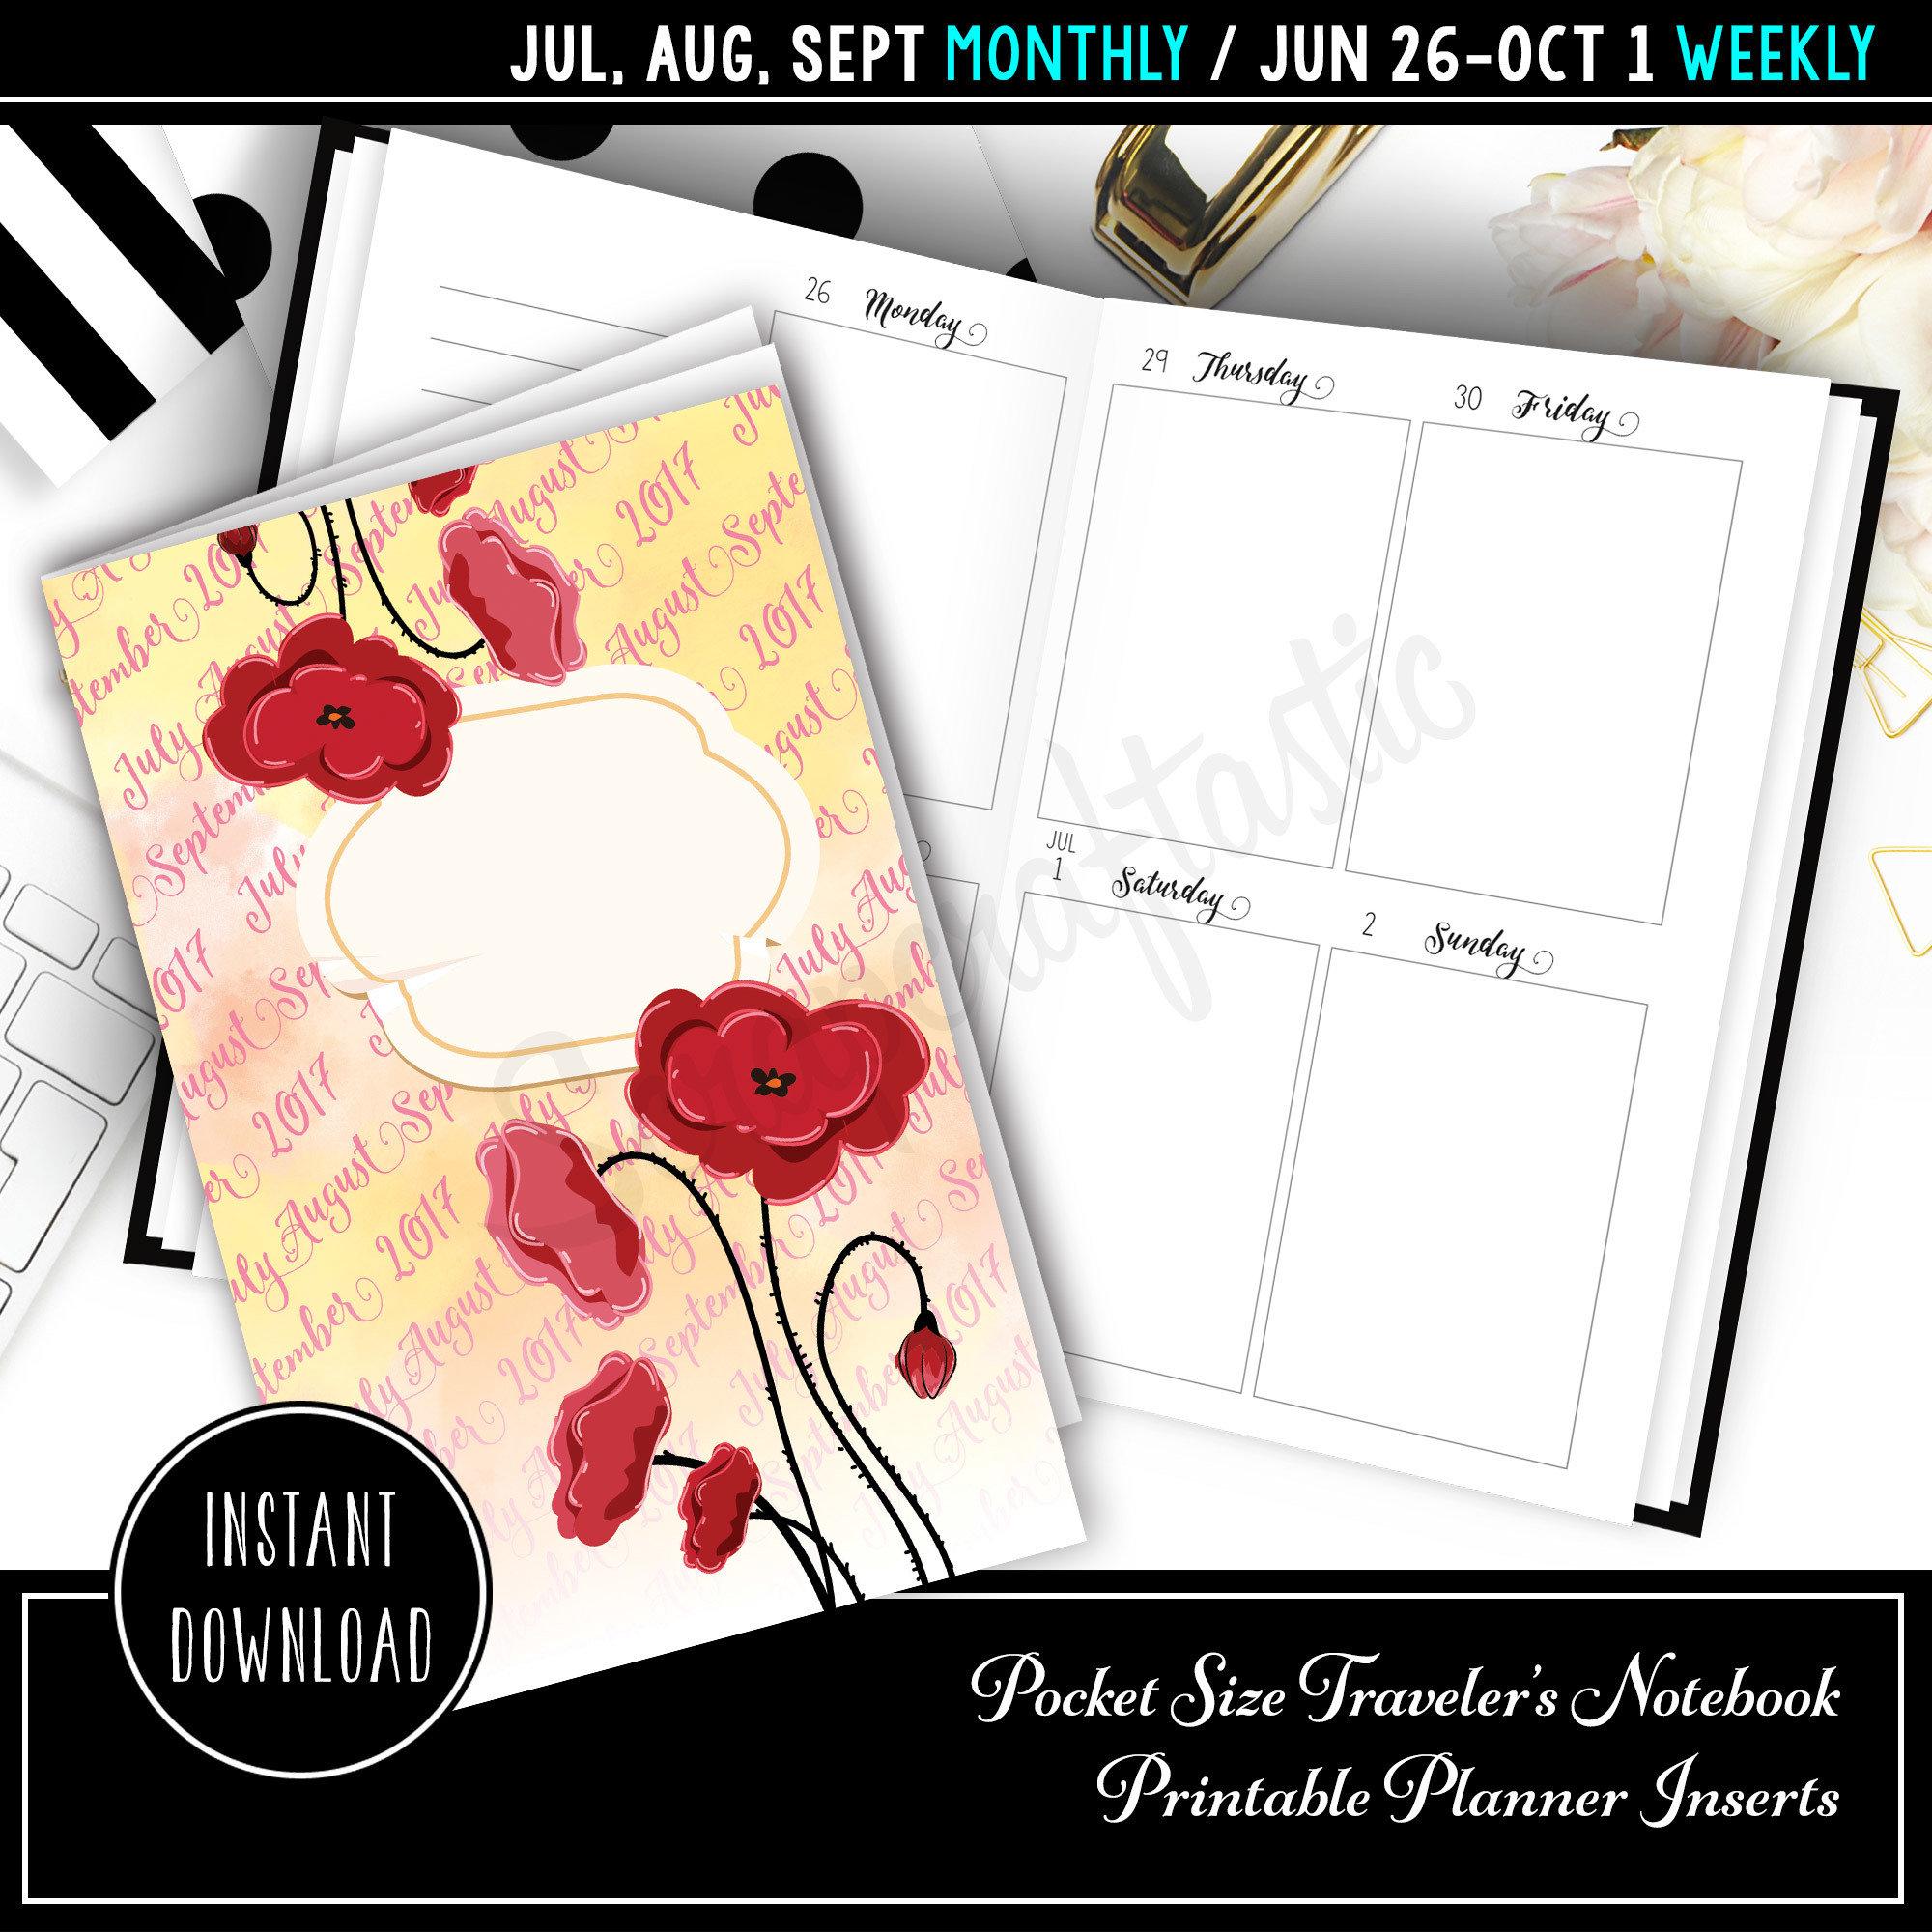 Jul-Sep 2017 Pocket Traveler's Notebook Printable Planner Inserts 10001